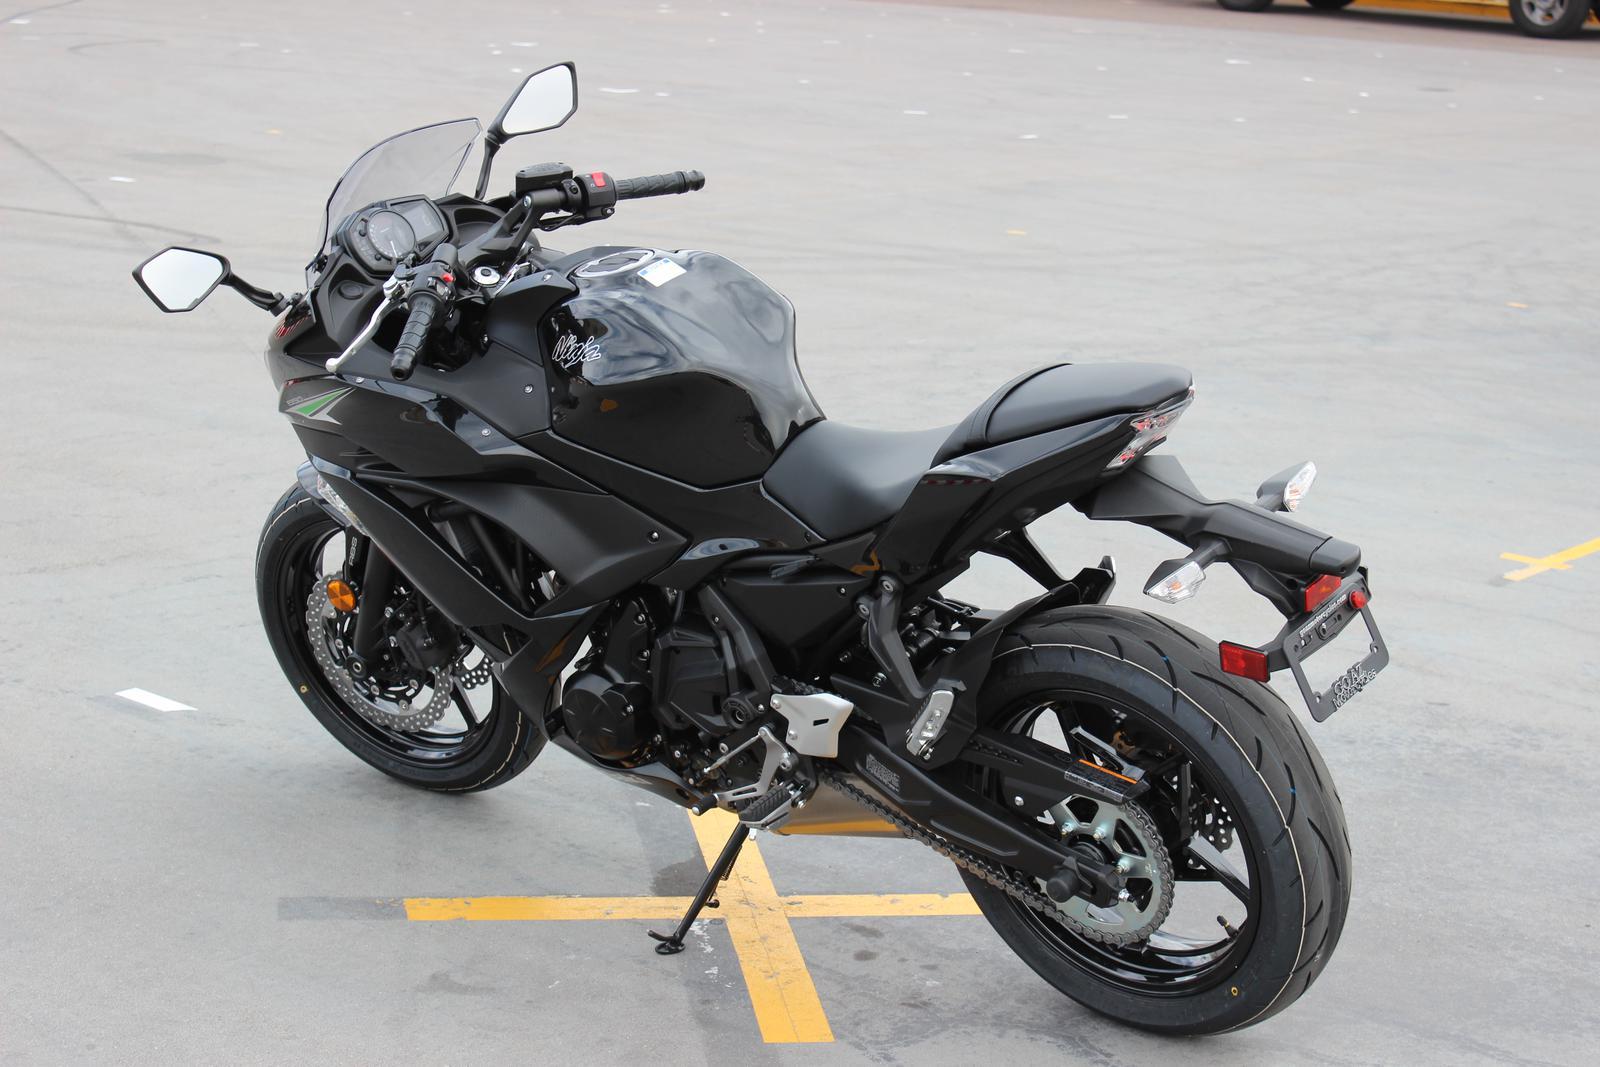 2017 Kawasaki Ninja 650 For Sale In Scottsdale Az Go Az